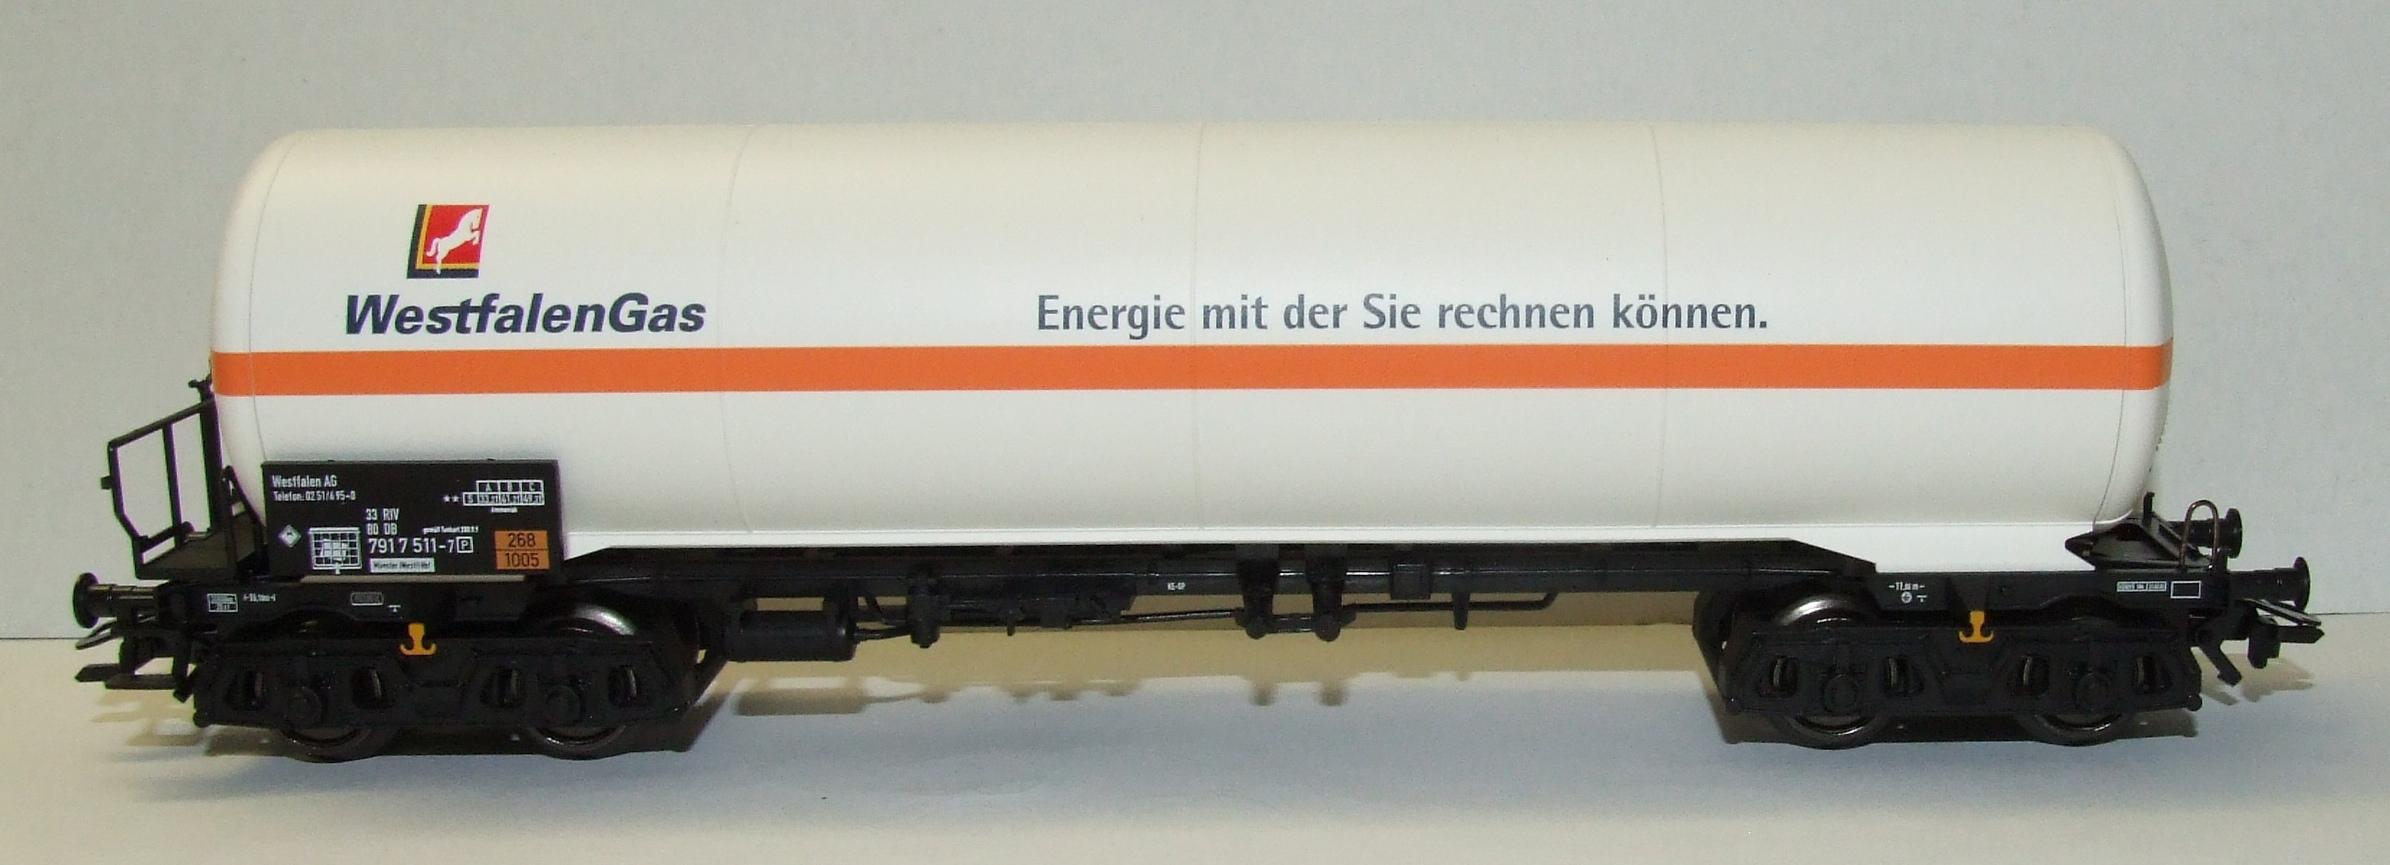 Märklin 94413 Kesselwagen Westfalengas limitiertes Sondermodell H0 AC